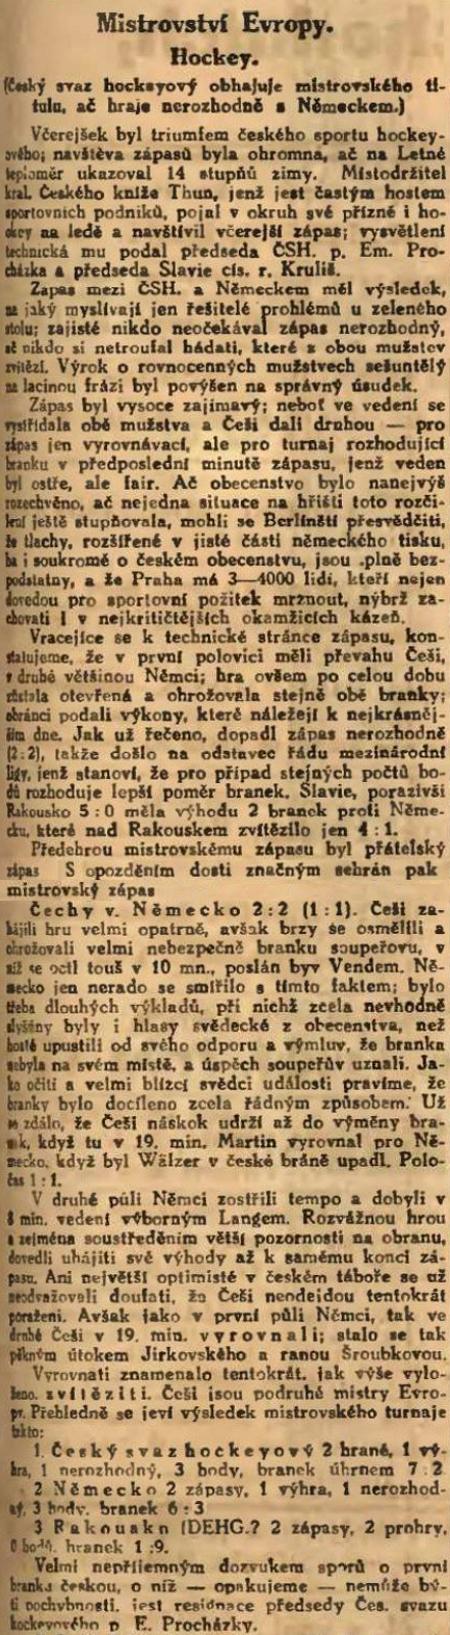 NL 1912-02-05.jpg